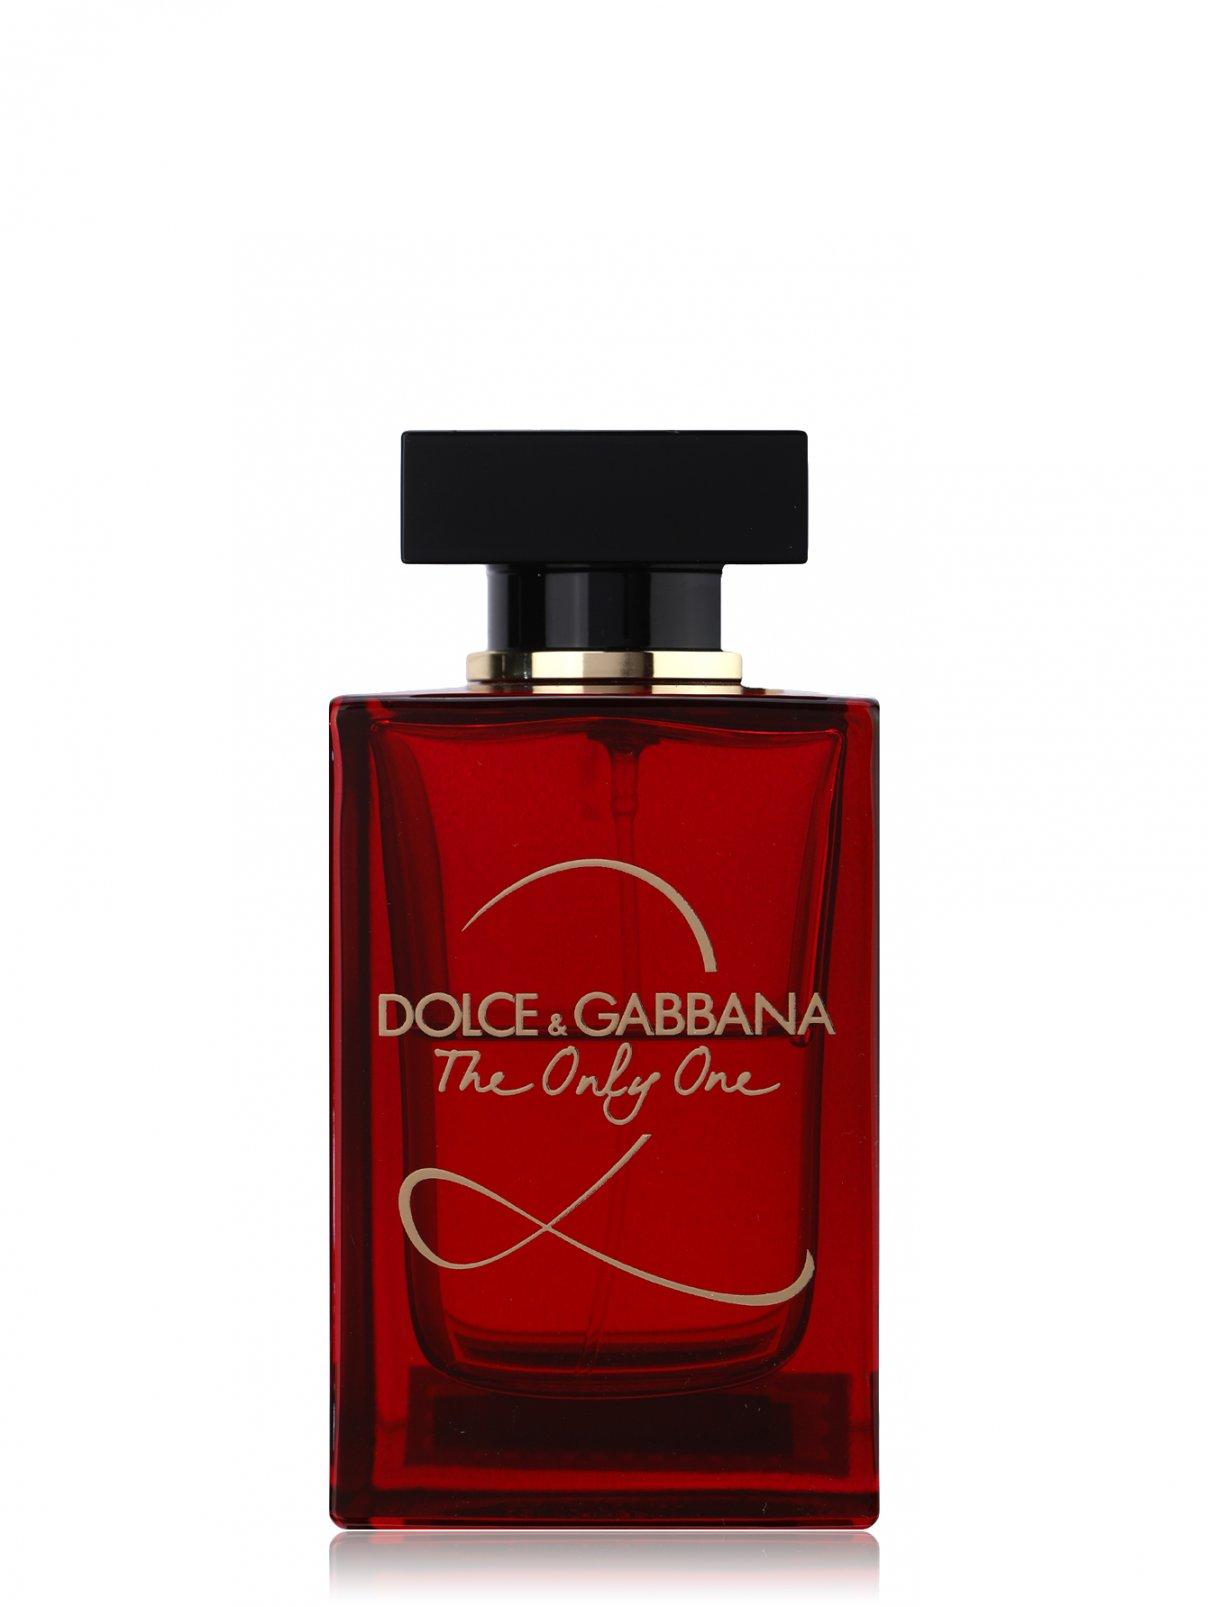 Парфюмерная вода THE ONLY ONE 2, 50 мл Dolce & Gabbana  –  Общий вид